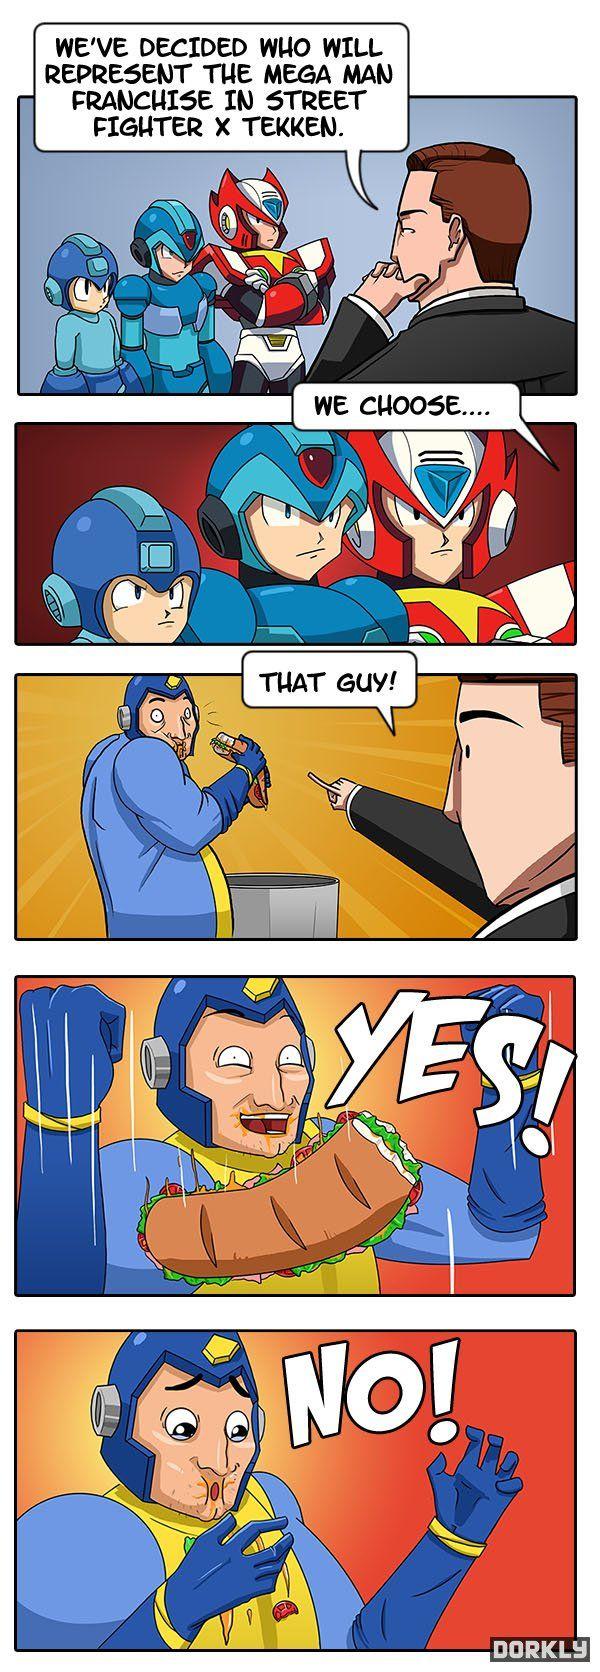 This made me laugh so hard! Mega man, Street fighter